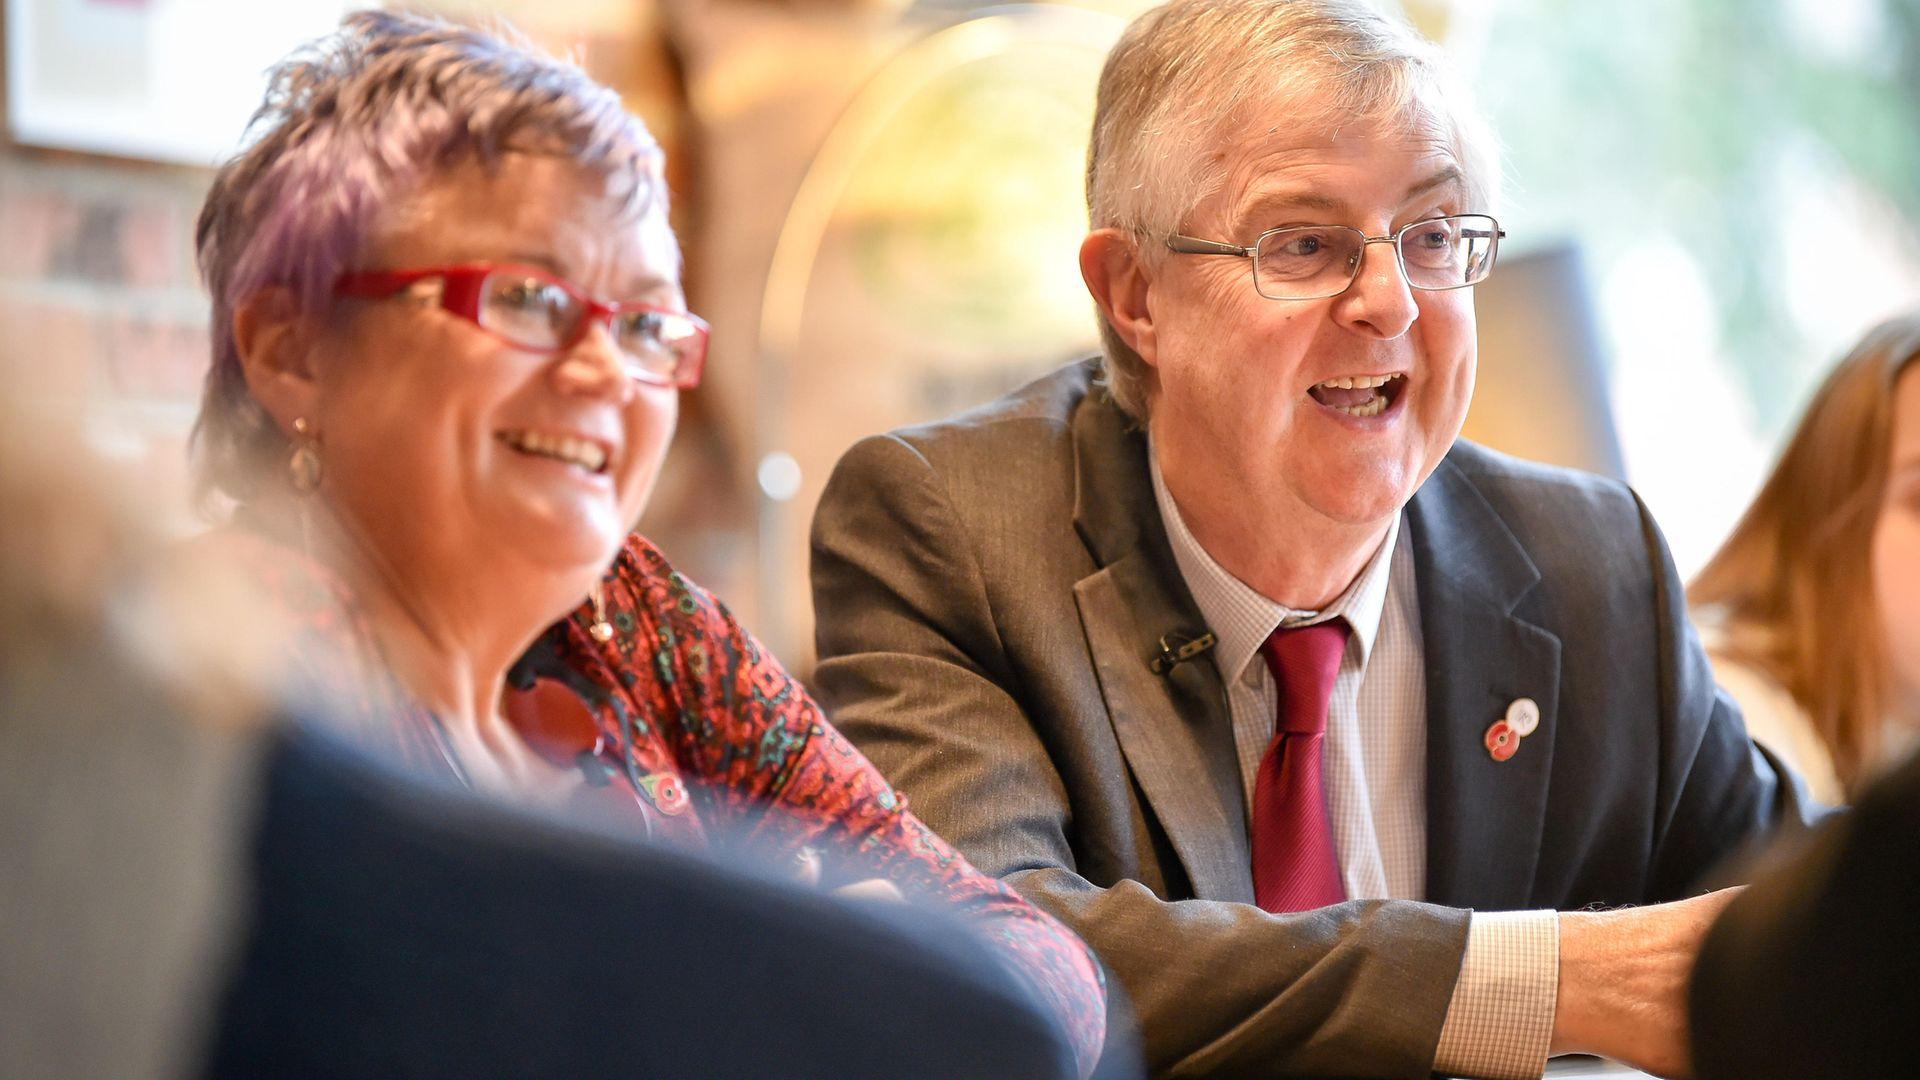 Welsh Labour leader Mark Drakeford AM and deputy leader Carolyn Harris MP - Credit: PA